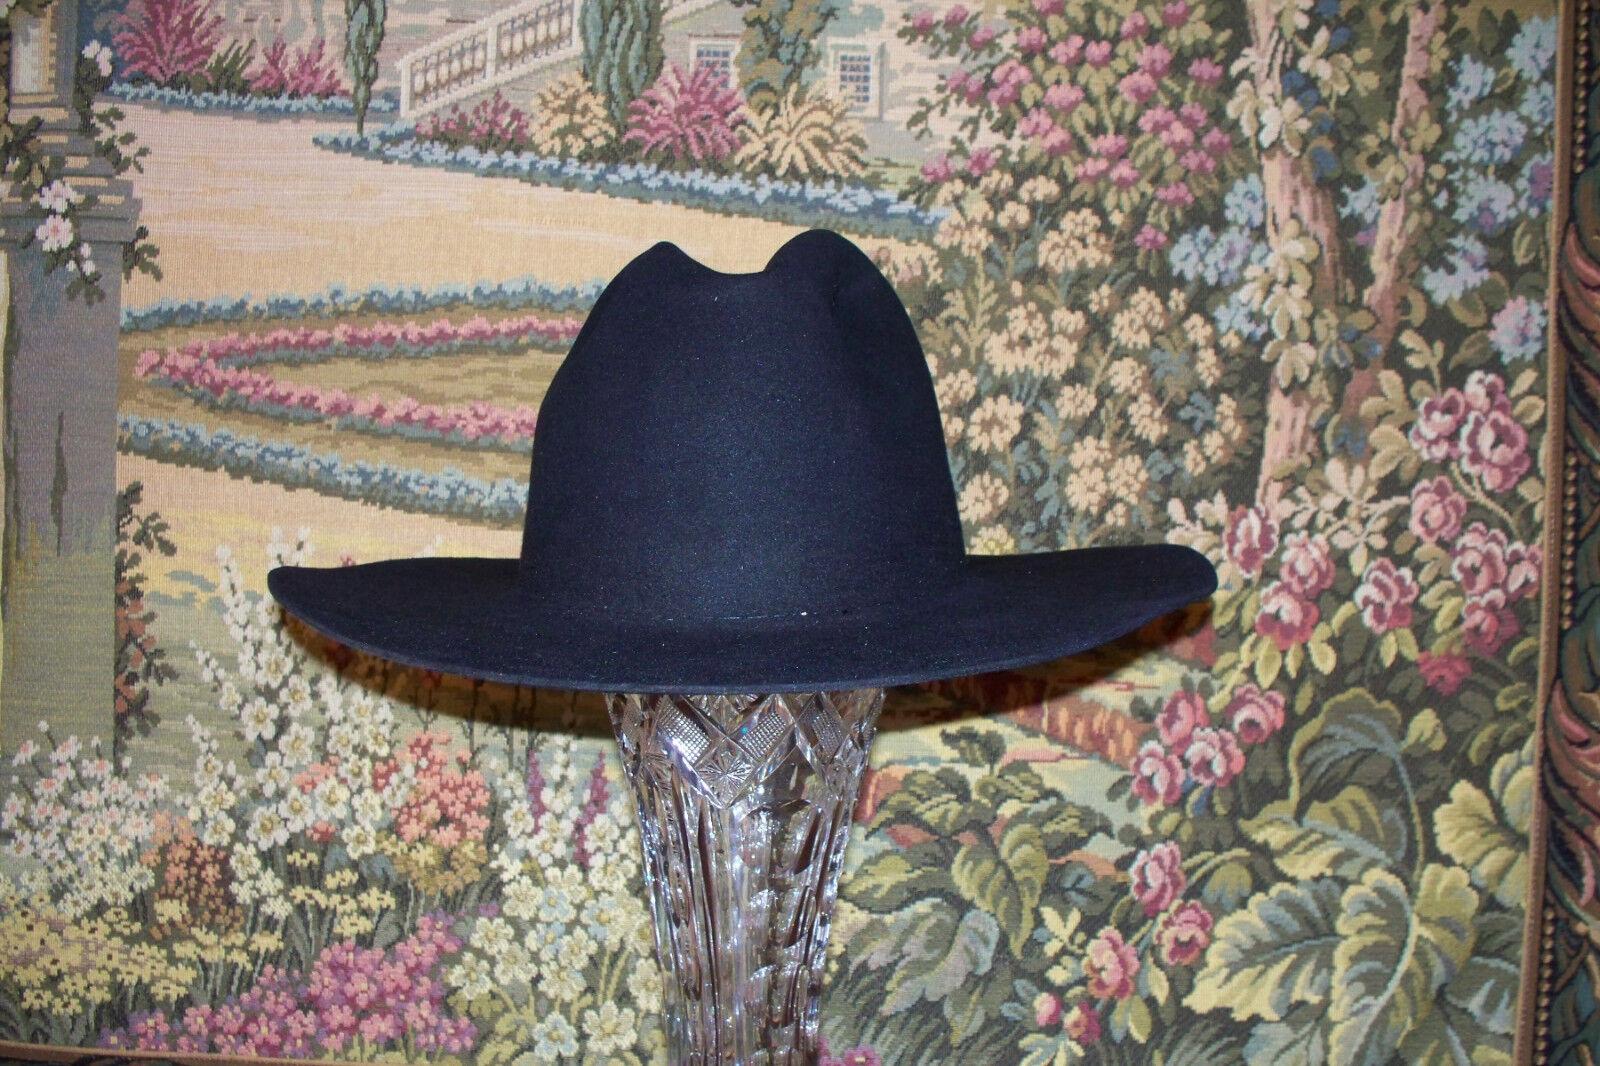 American Hat Company Black 5/8 Beaver Felt Sz 7 5/8 Black  in Box Worn a few times 6dc761